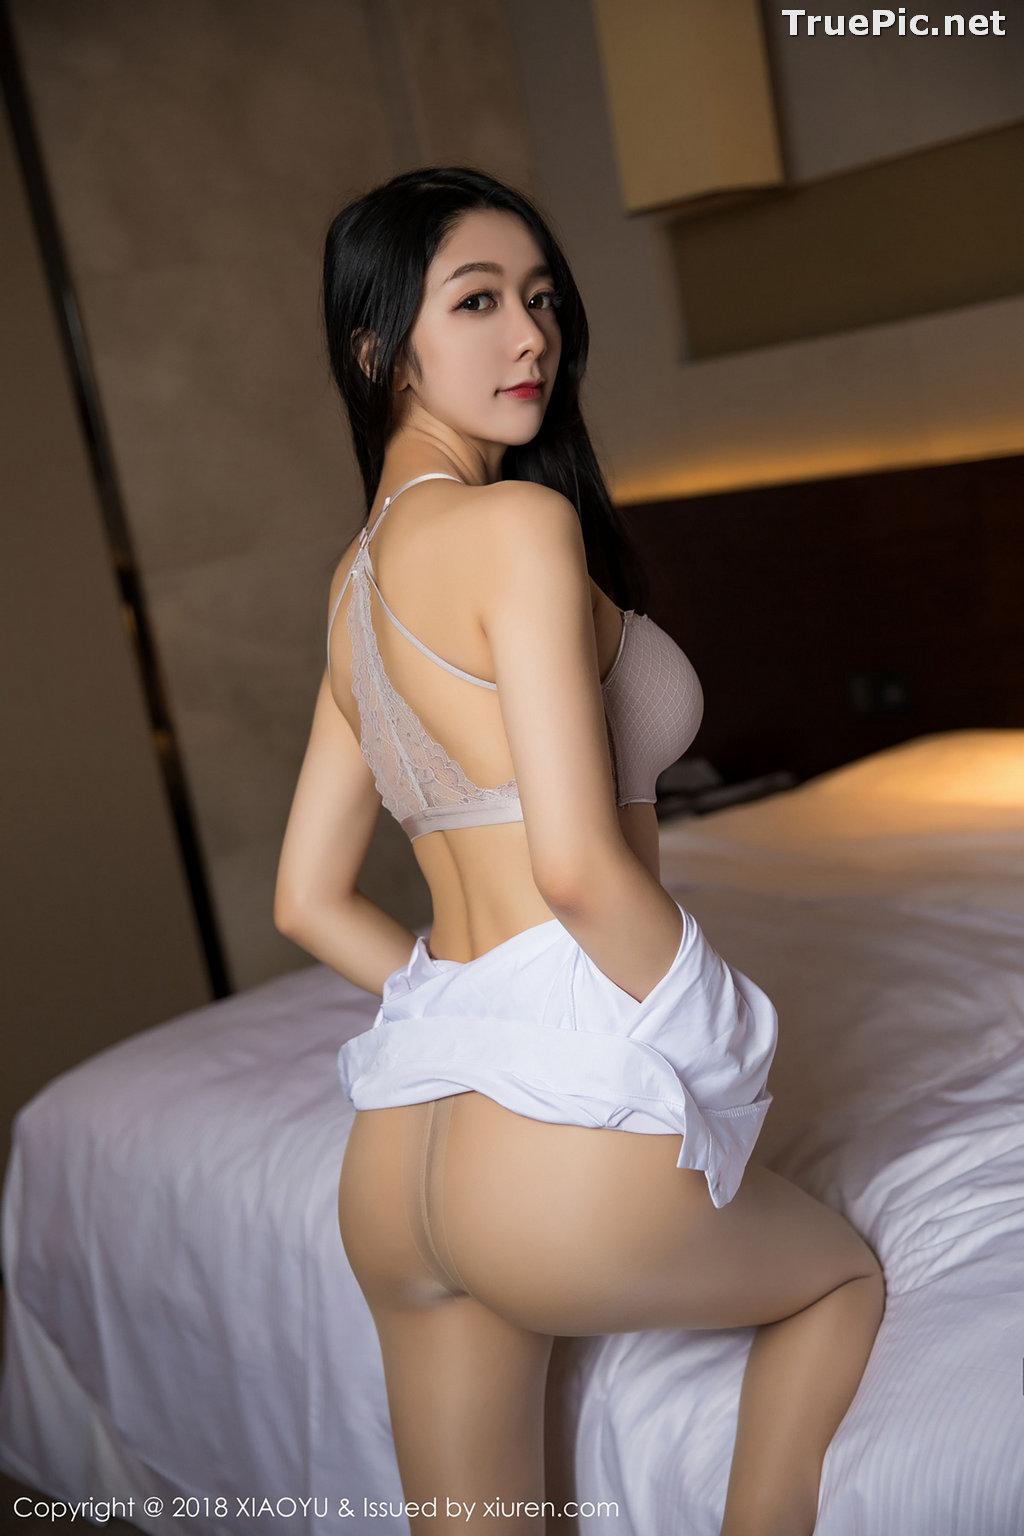 Image XiaoYu No.004 - Chinese Model - Xiao Reba (Angela喜欢猫) - White Sexy Nurse - TruePic.net - Picture-39